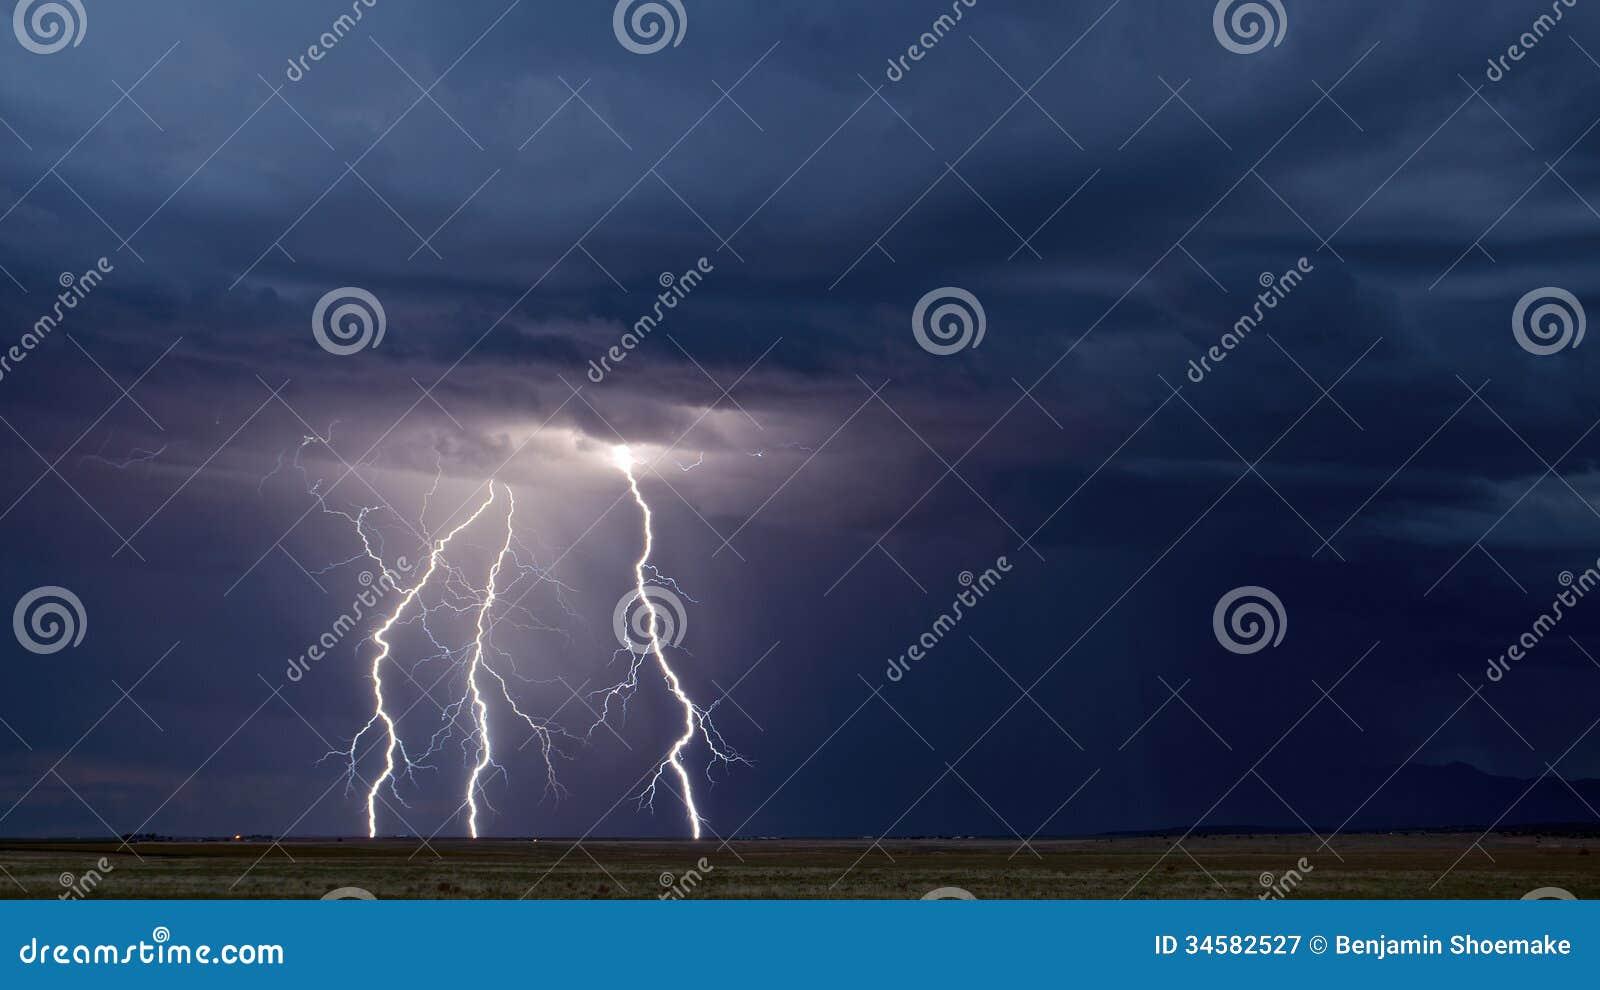 Triple Threat: Lightning